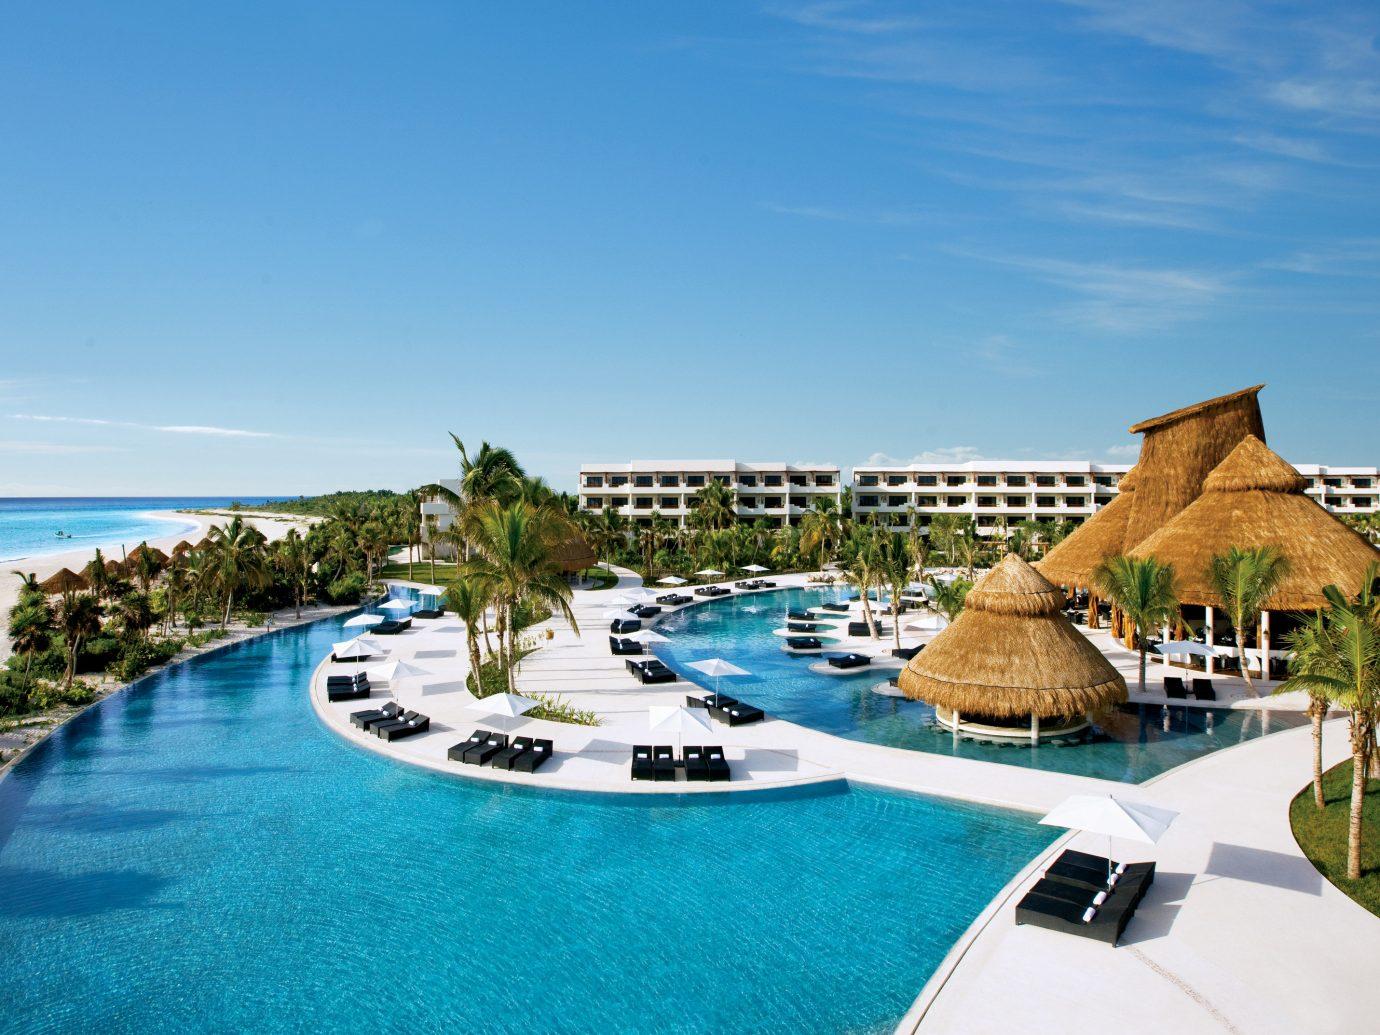 All-Inclusive Resorts Hotels Romance sky Resort outdoor property resort town swimming pool leisure estate real estate tourism vacation blue hotel caribbean Sea condominium tropics Lagoon Villa Island